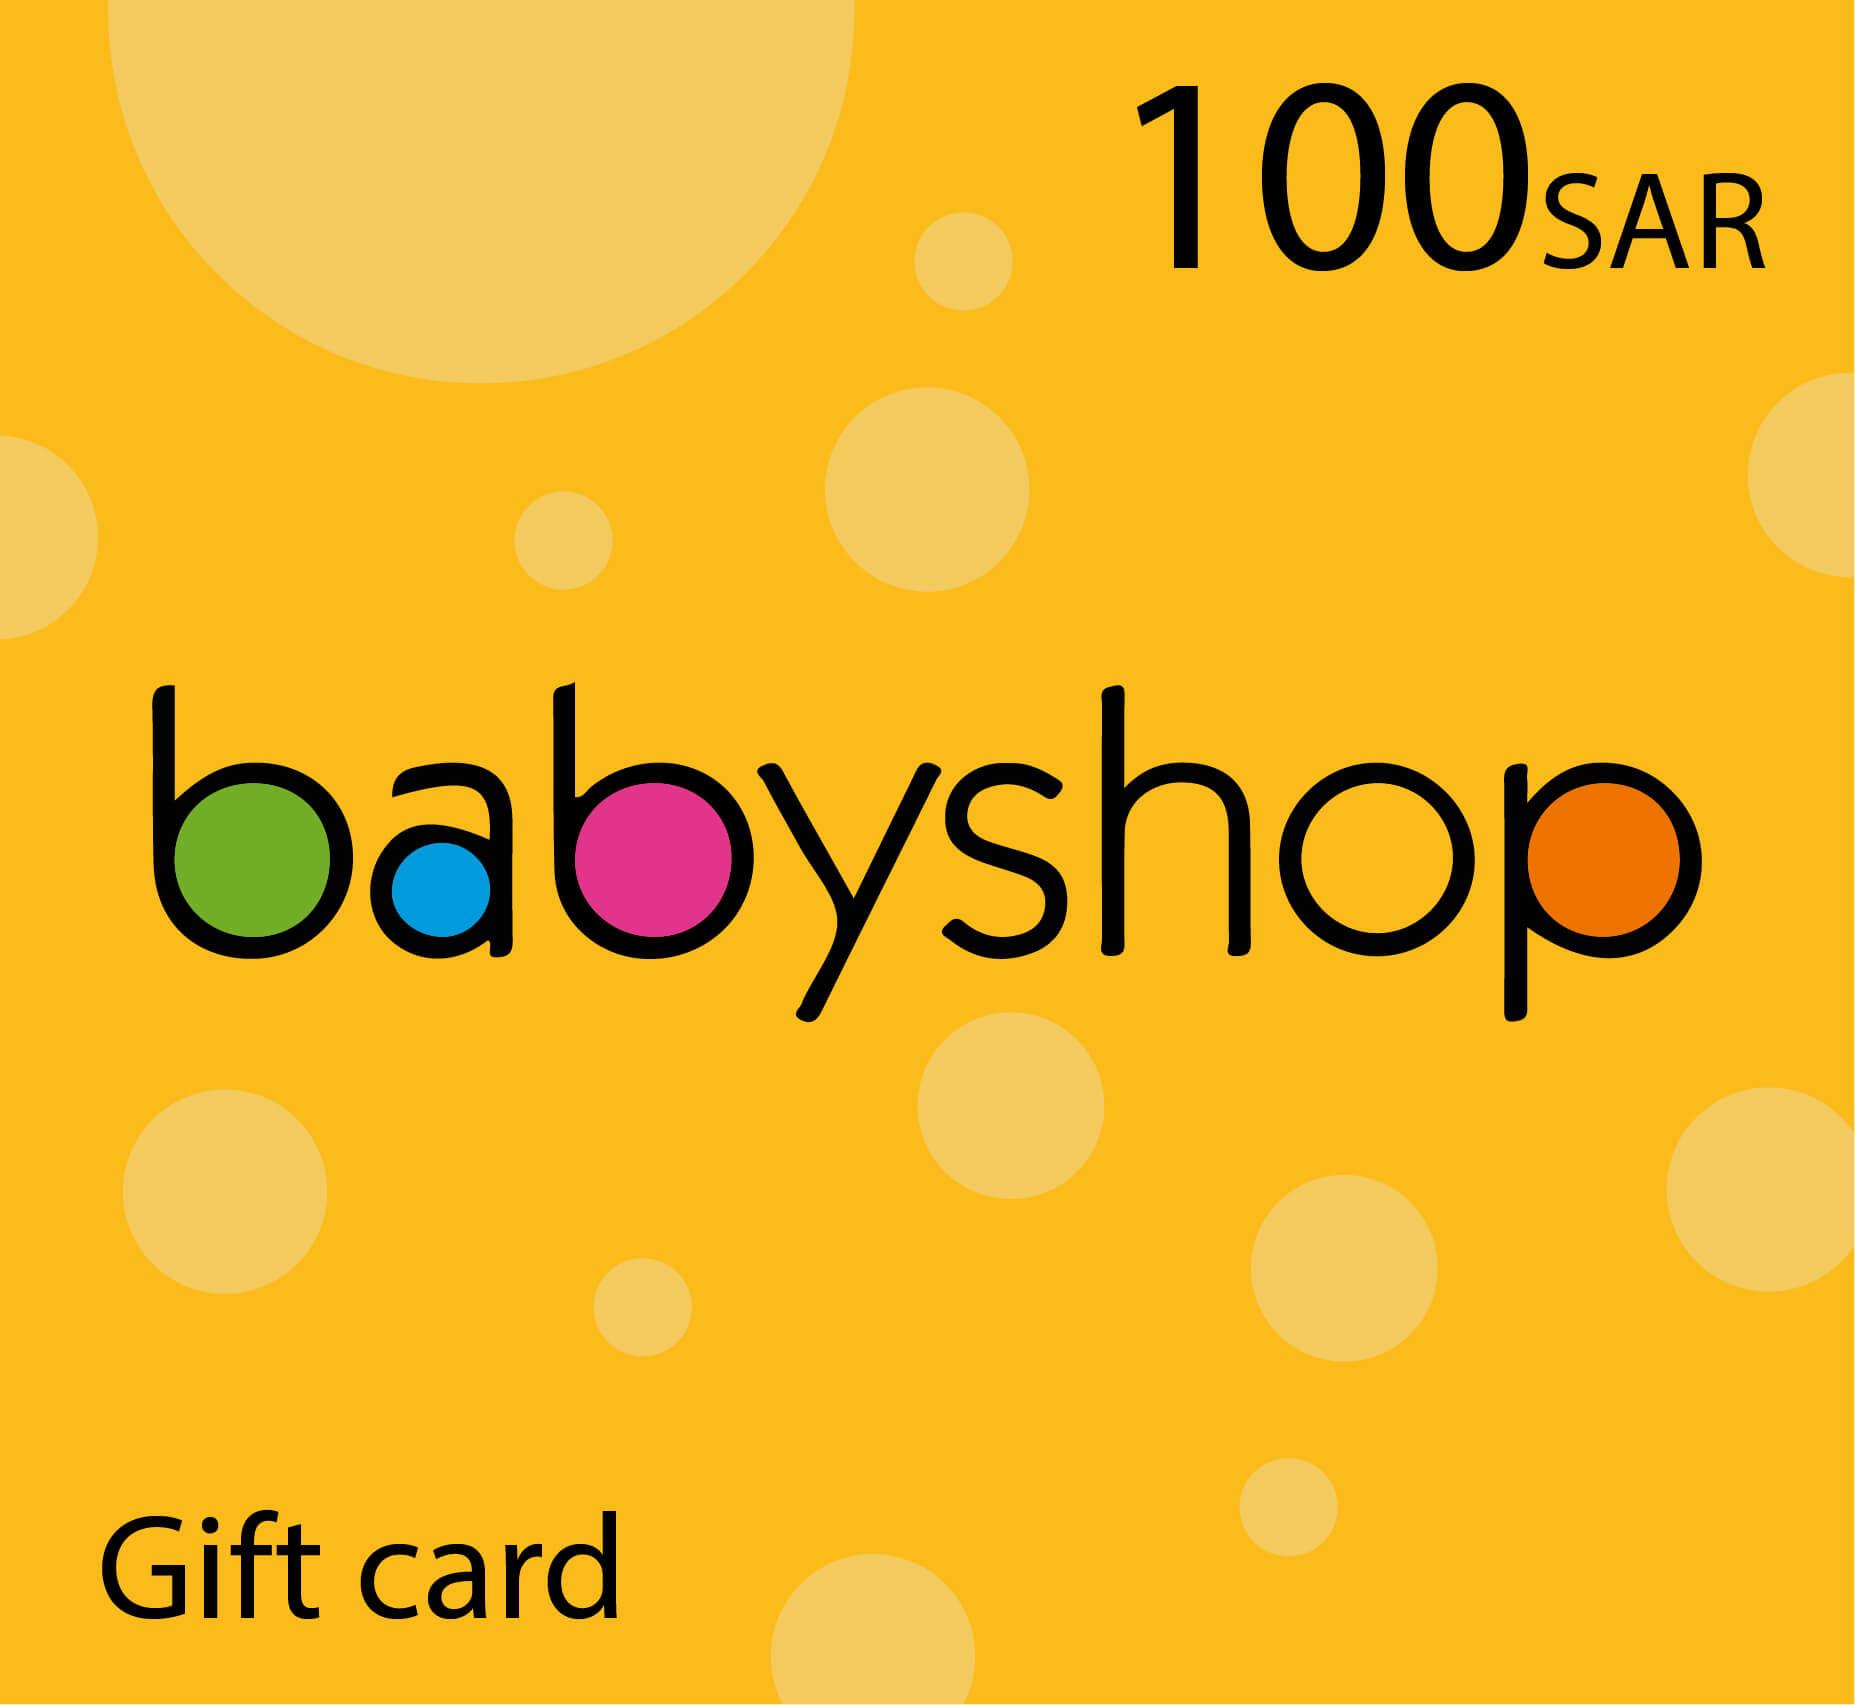 Baby Shop Gift Card - 100 SAR